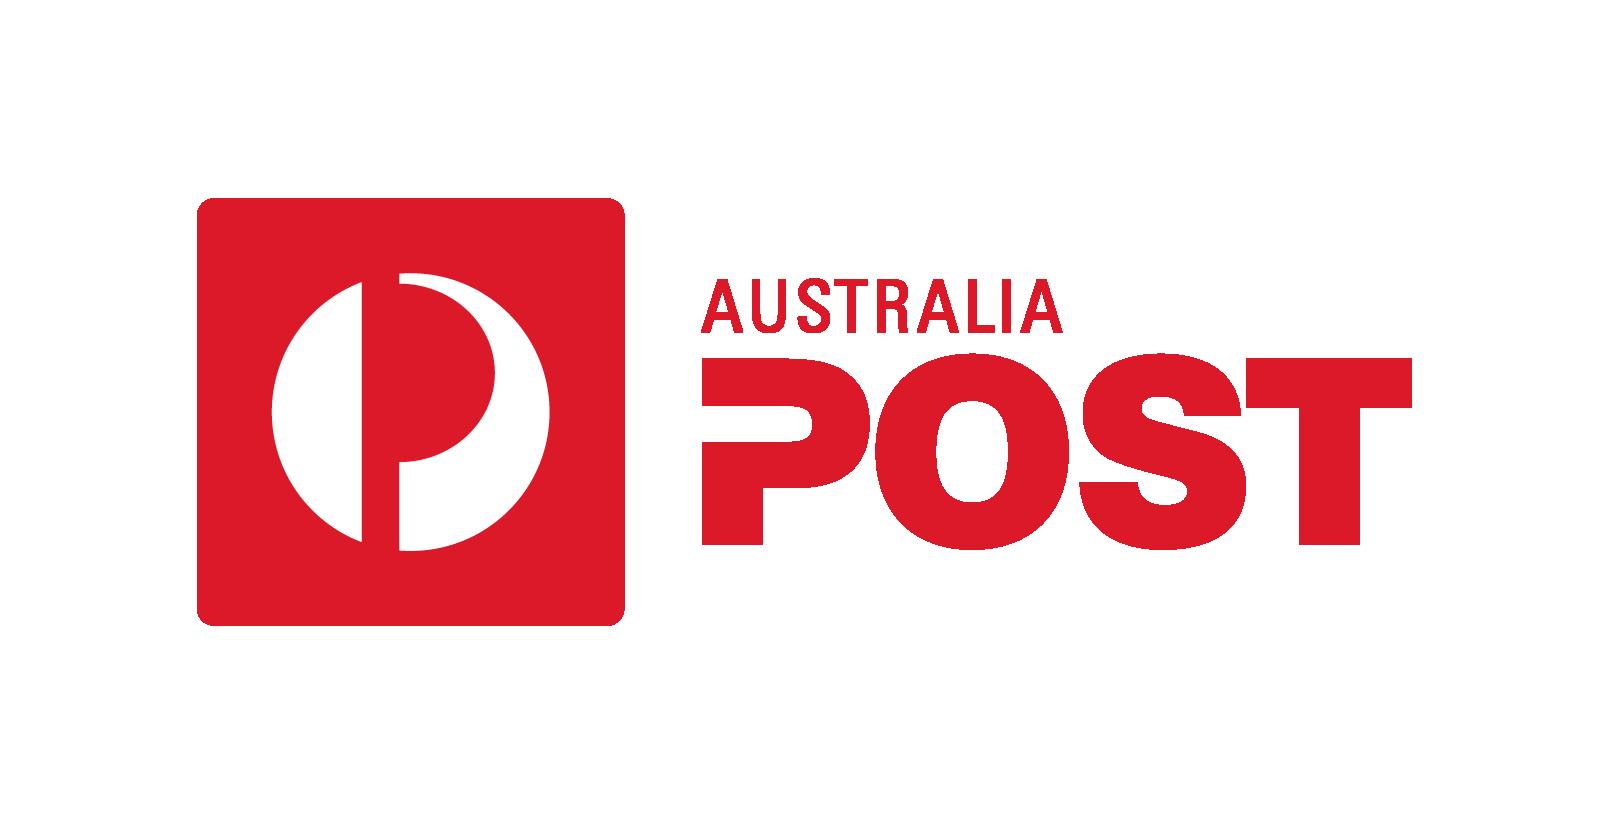 australiapost_logo.png